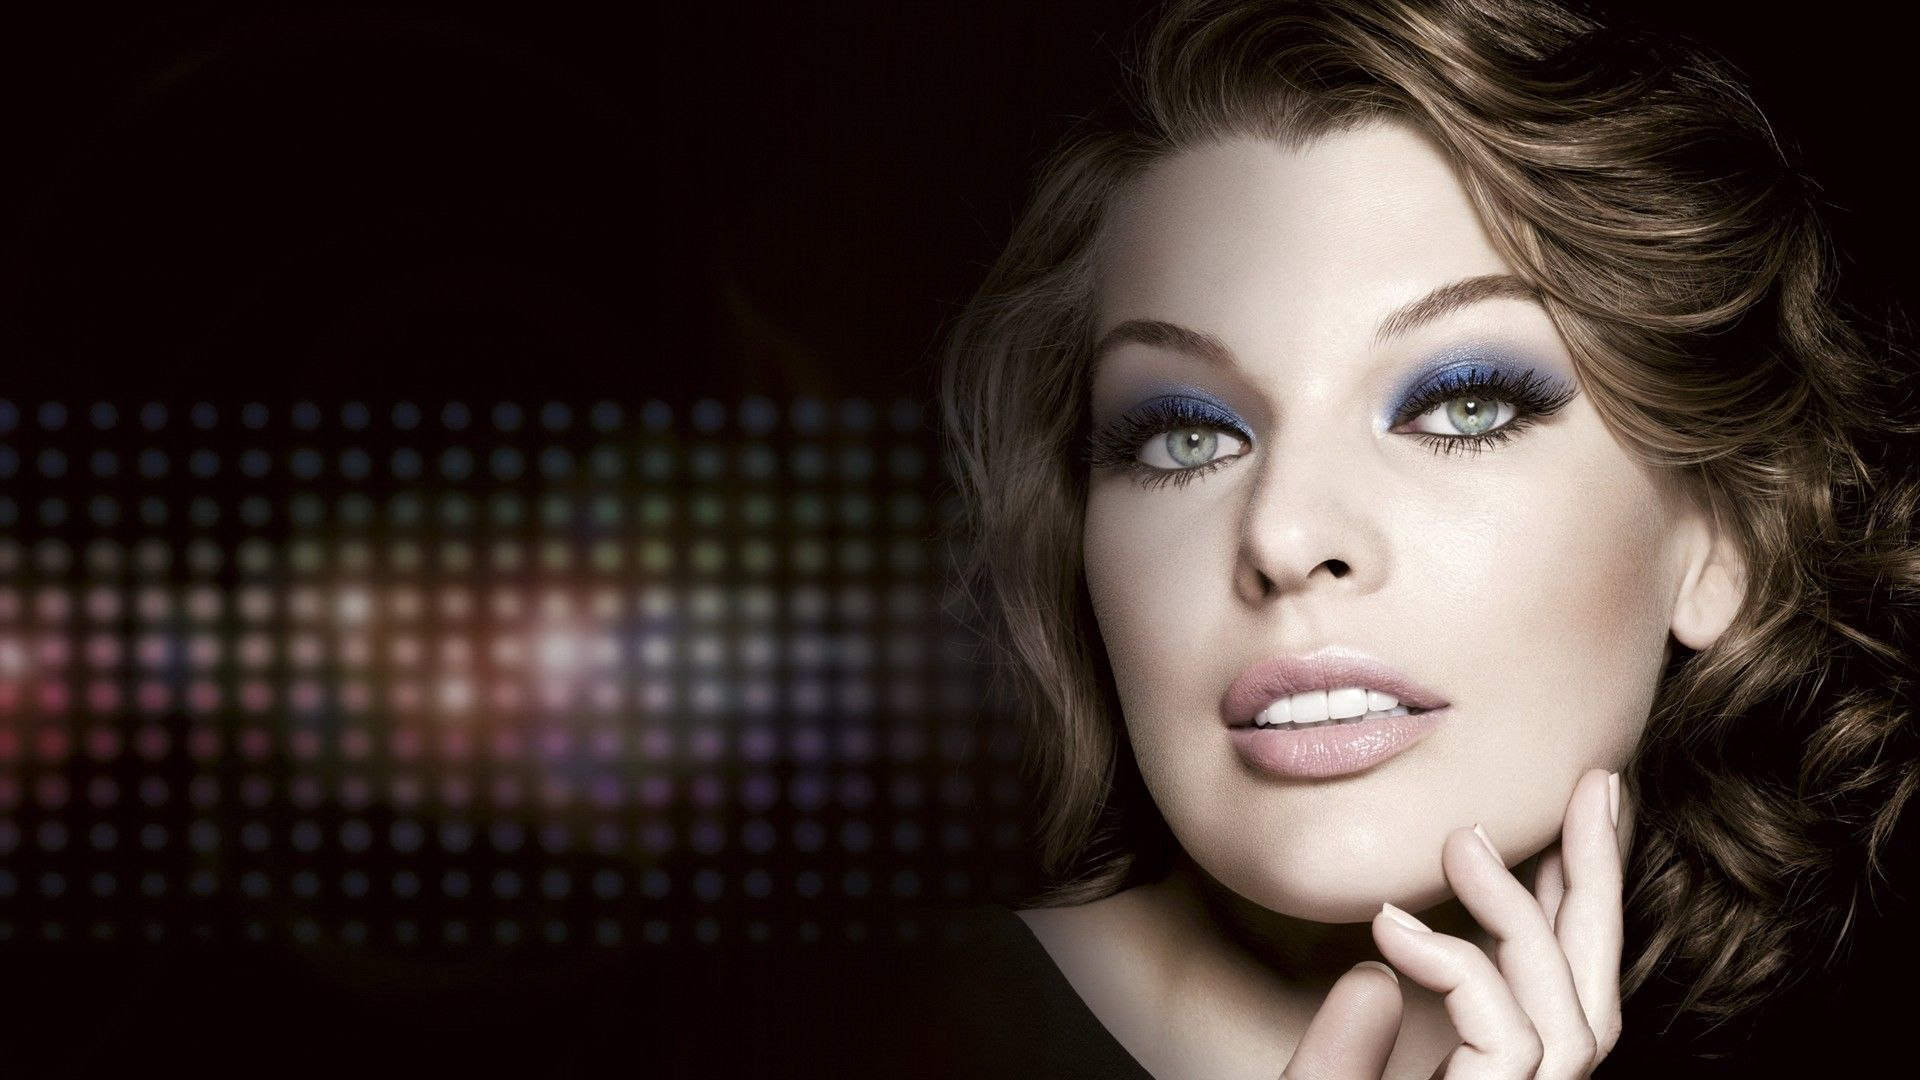 Milla Jovovich Photos